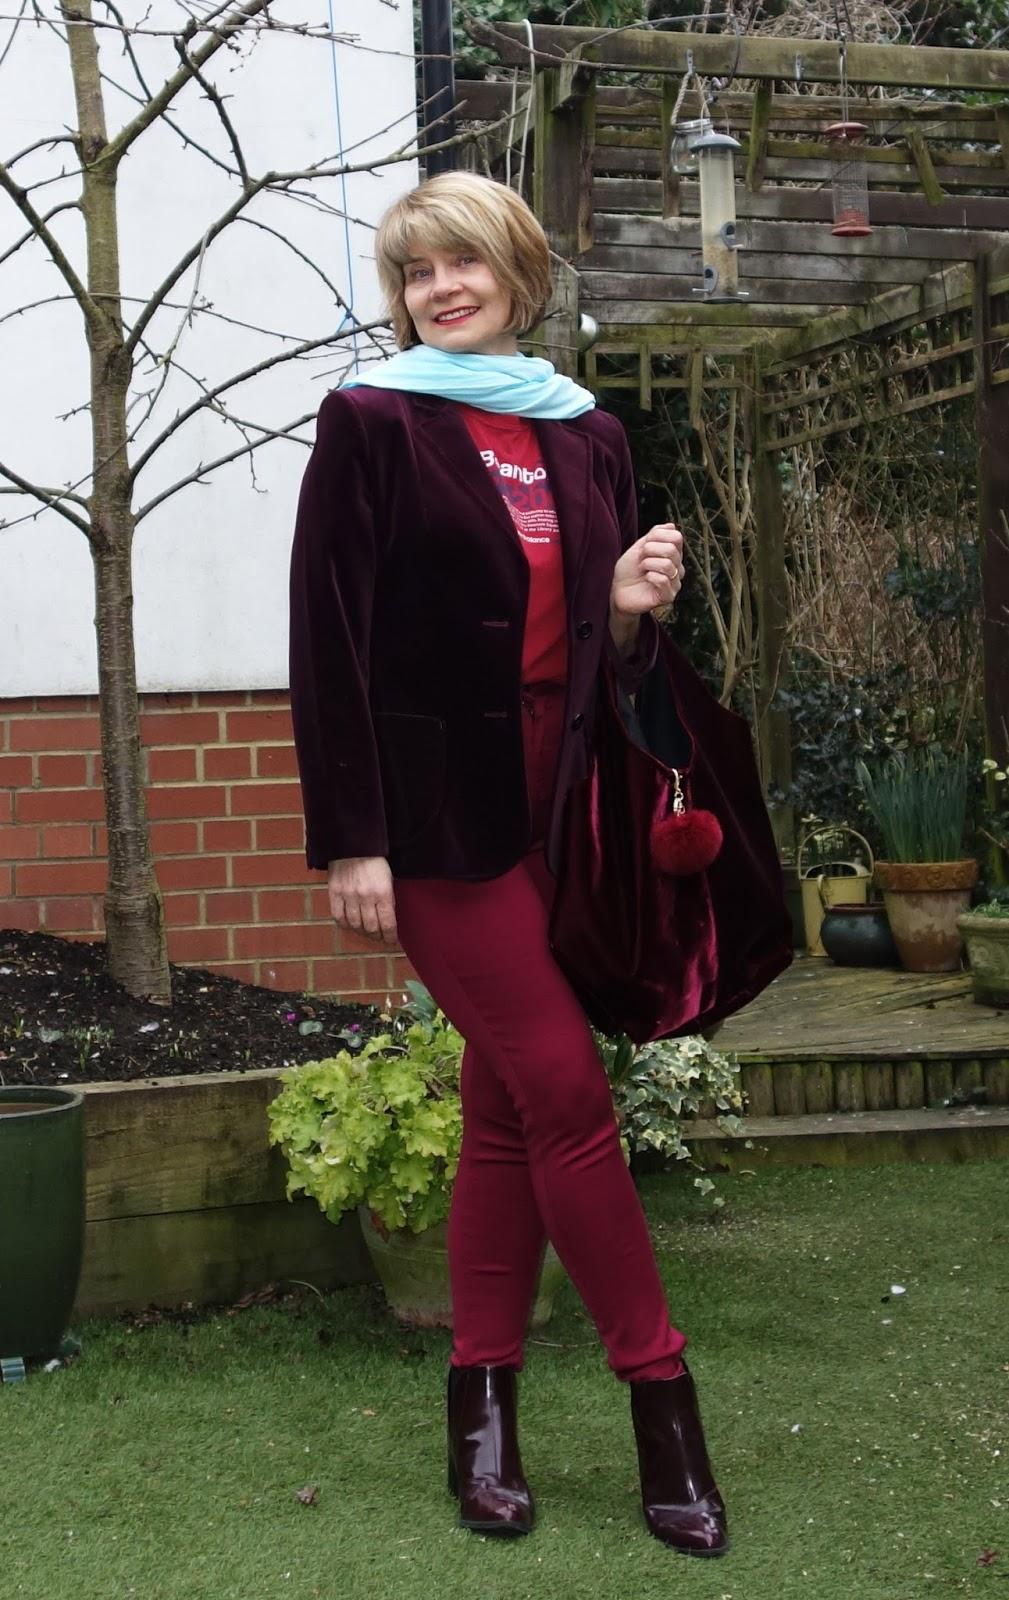 Image showing burgundy velvet jacket styled for casual wear